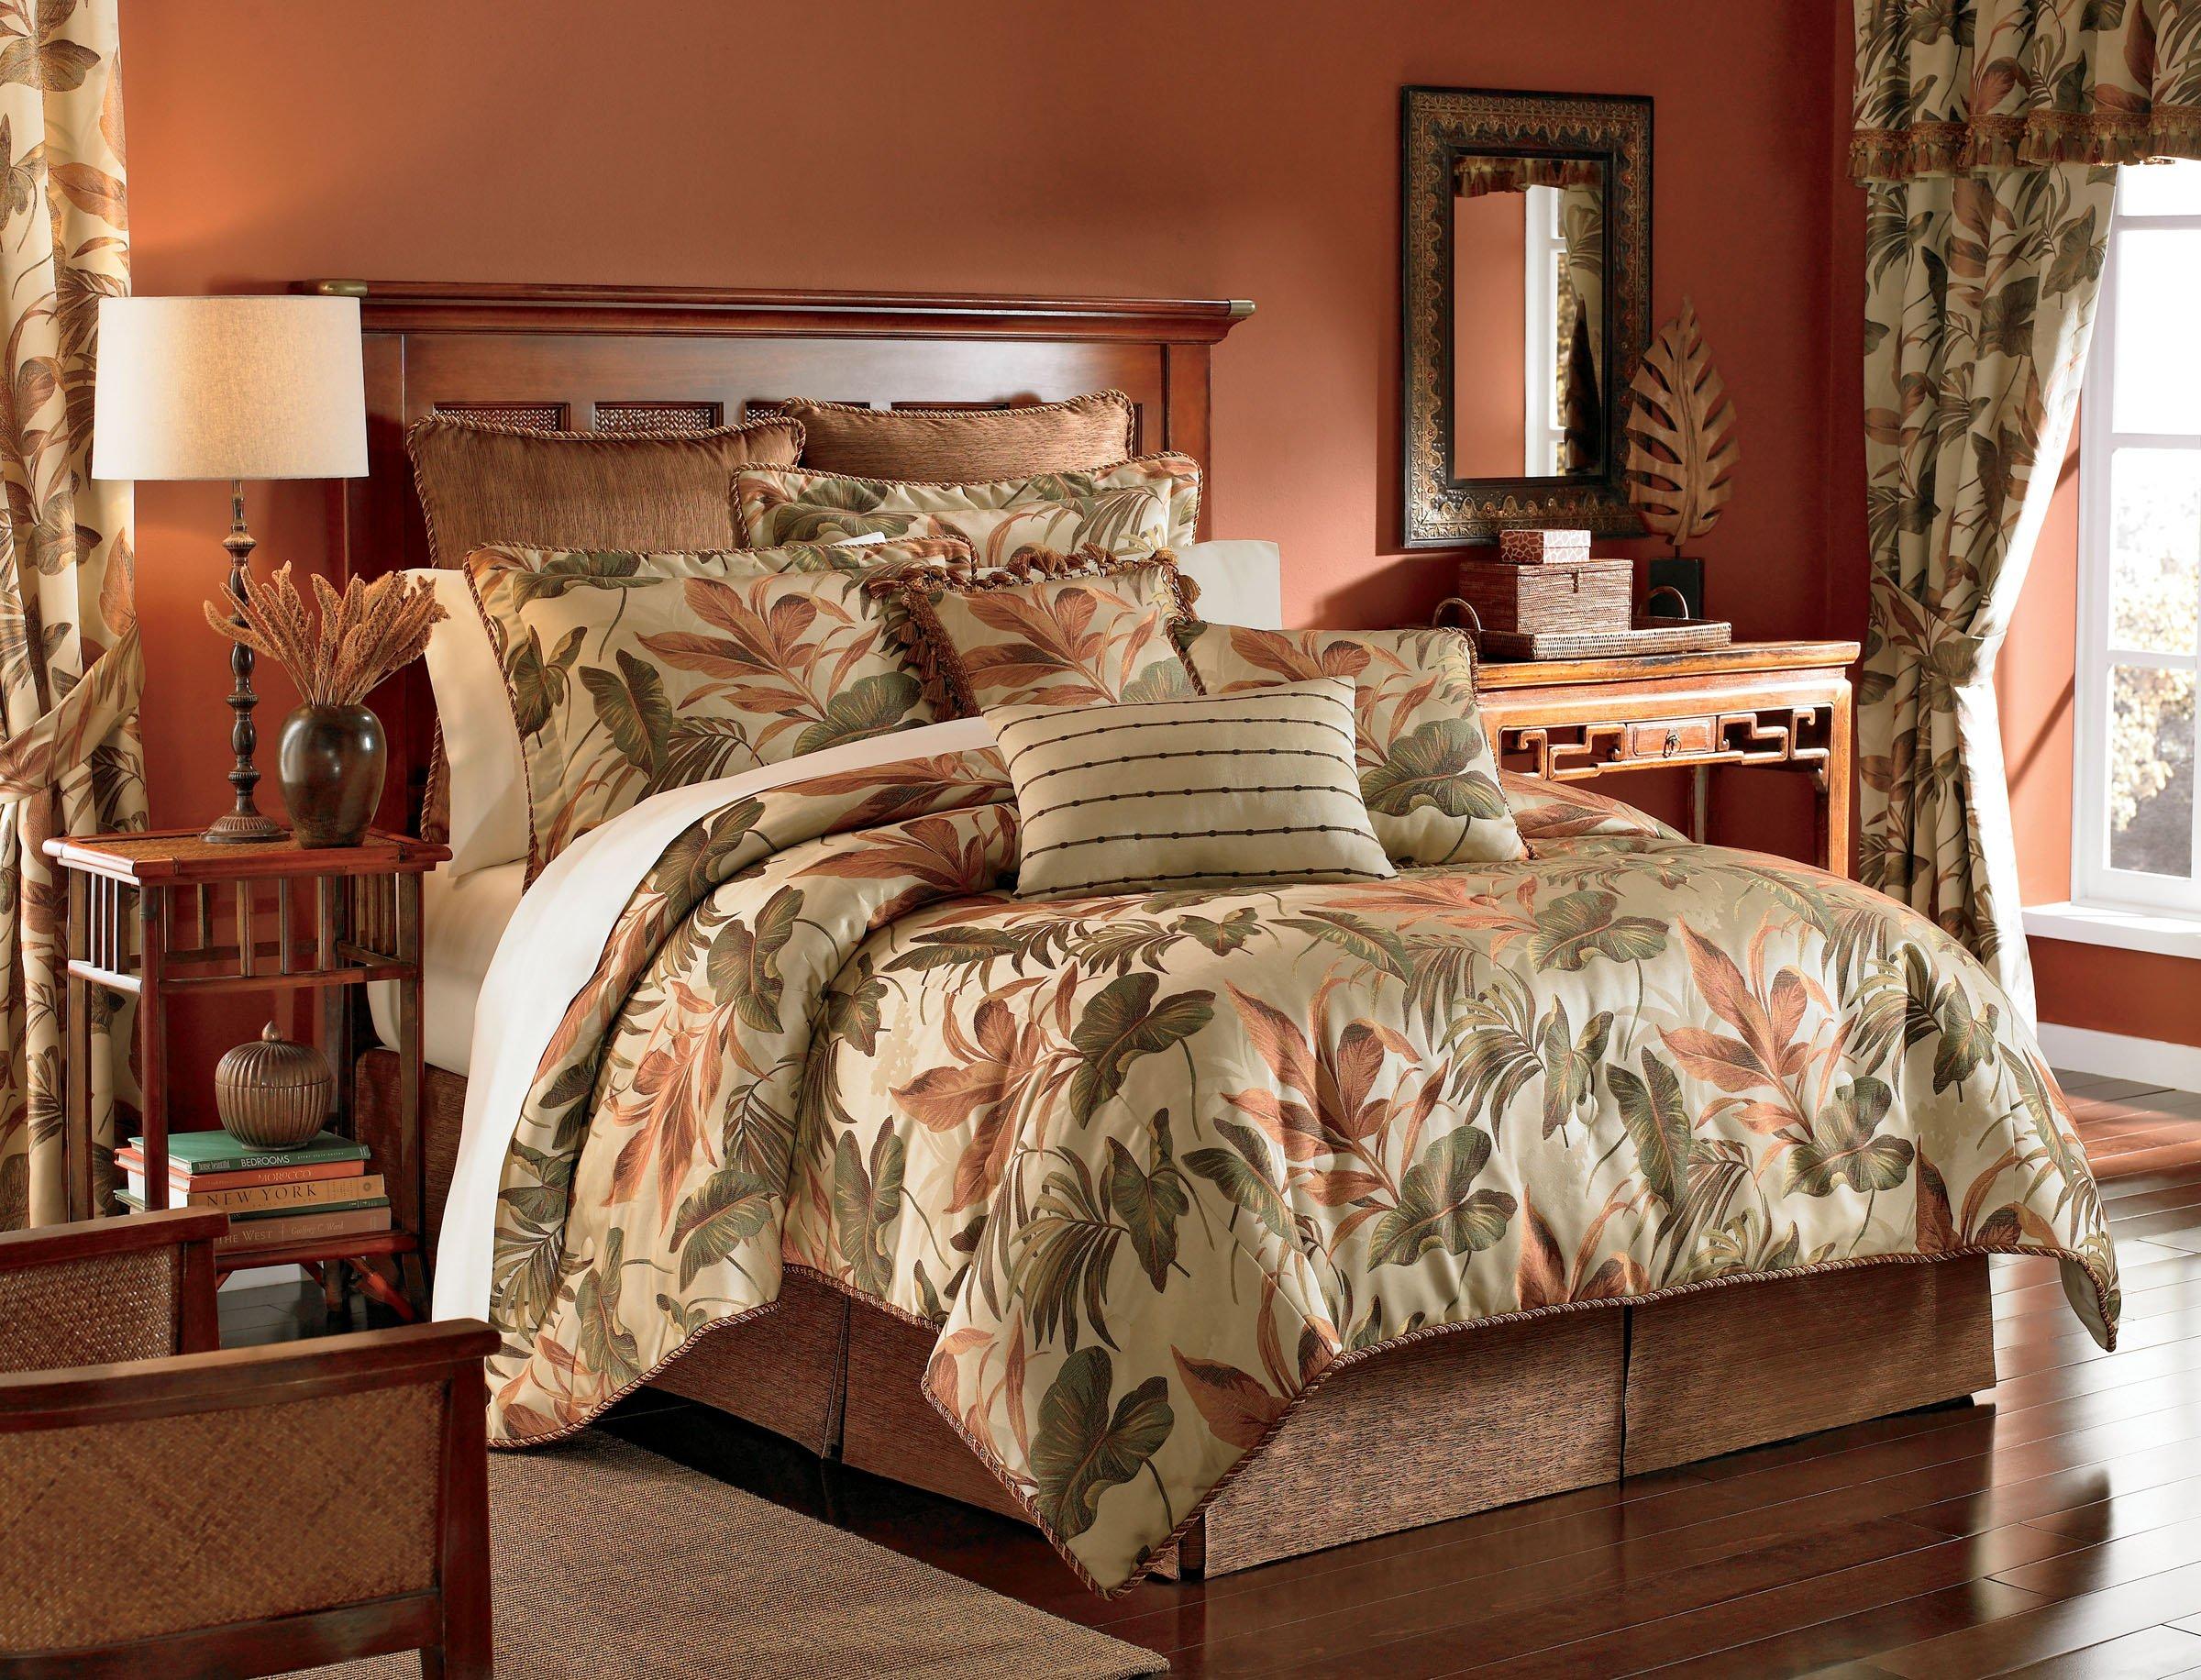 Croscill Home Fashions Bali 4-Piece Harvest King Size Comforter Set